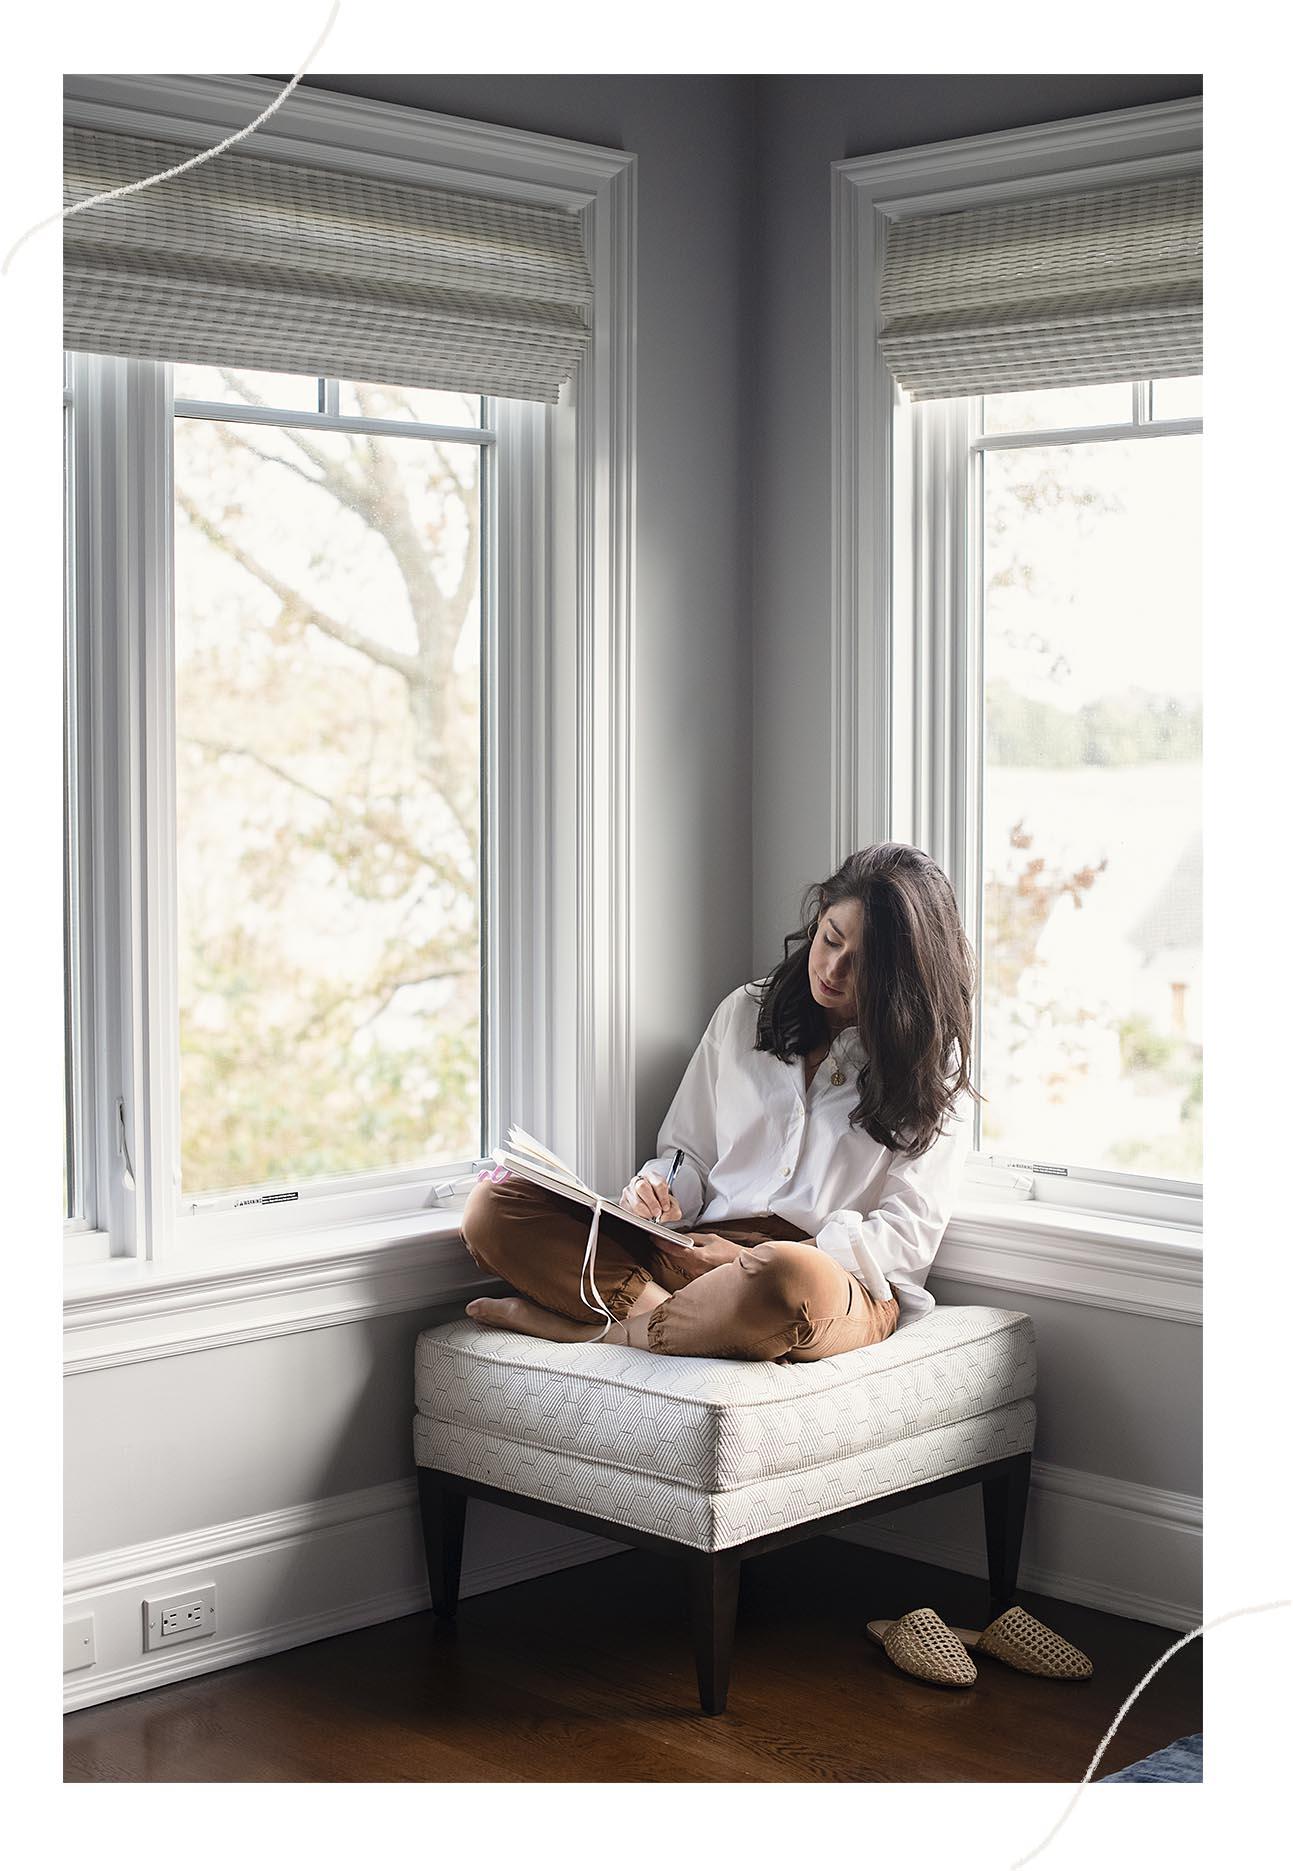 Jamie Mendell, Life Alchemist, sitting on an ottoman chair writing